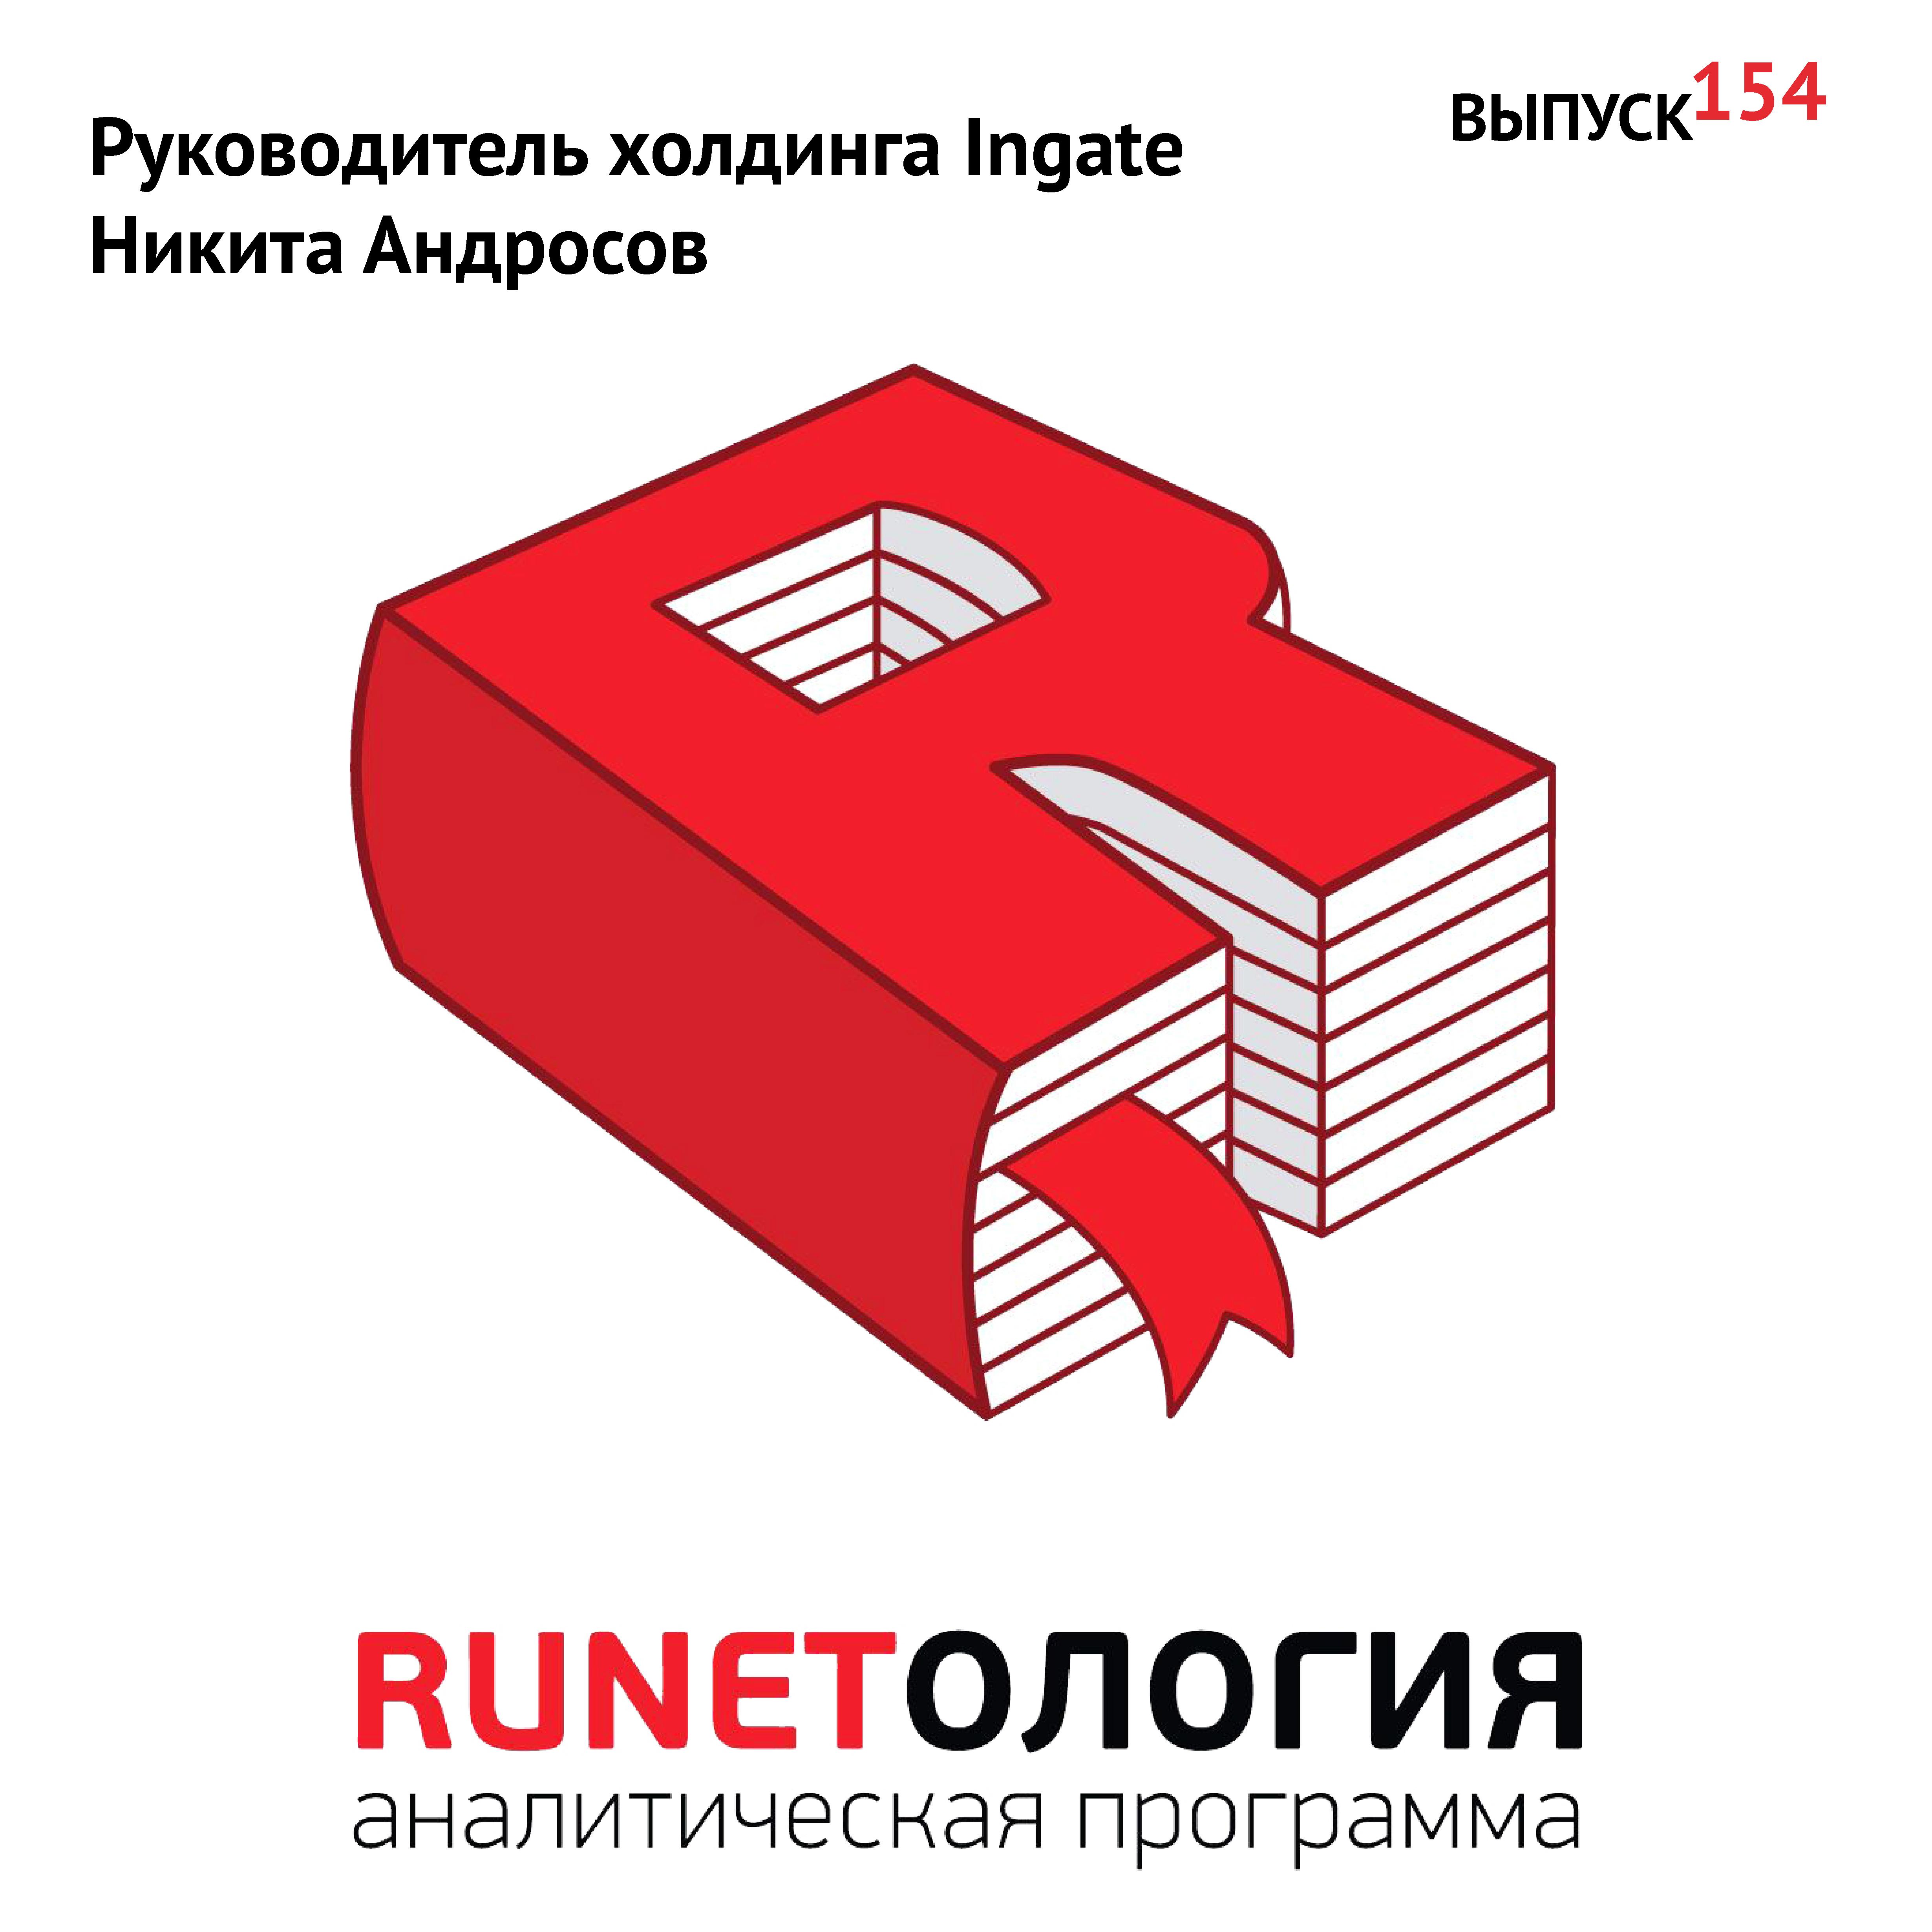 Максим Спиридонов Руководитель холдинга Ingate Никита Андросов